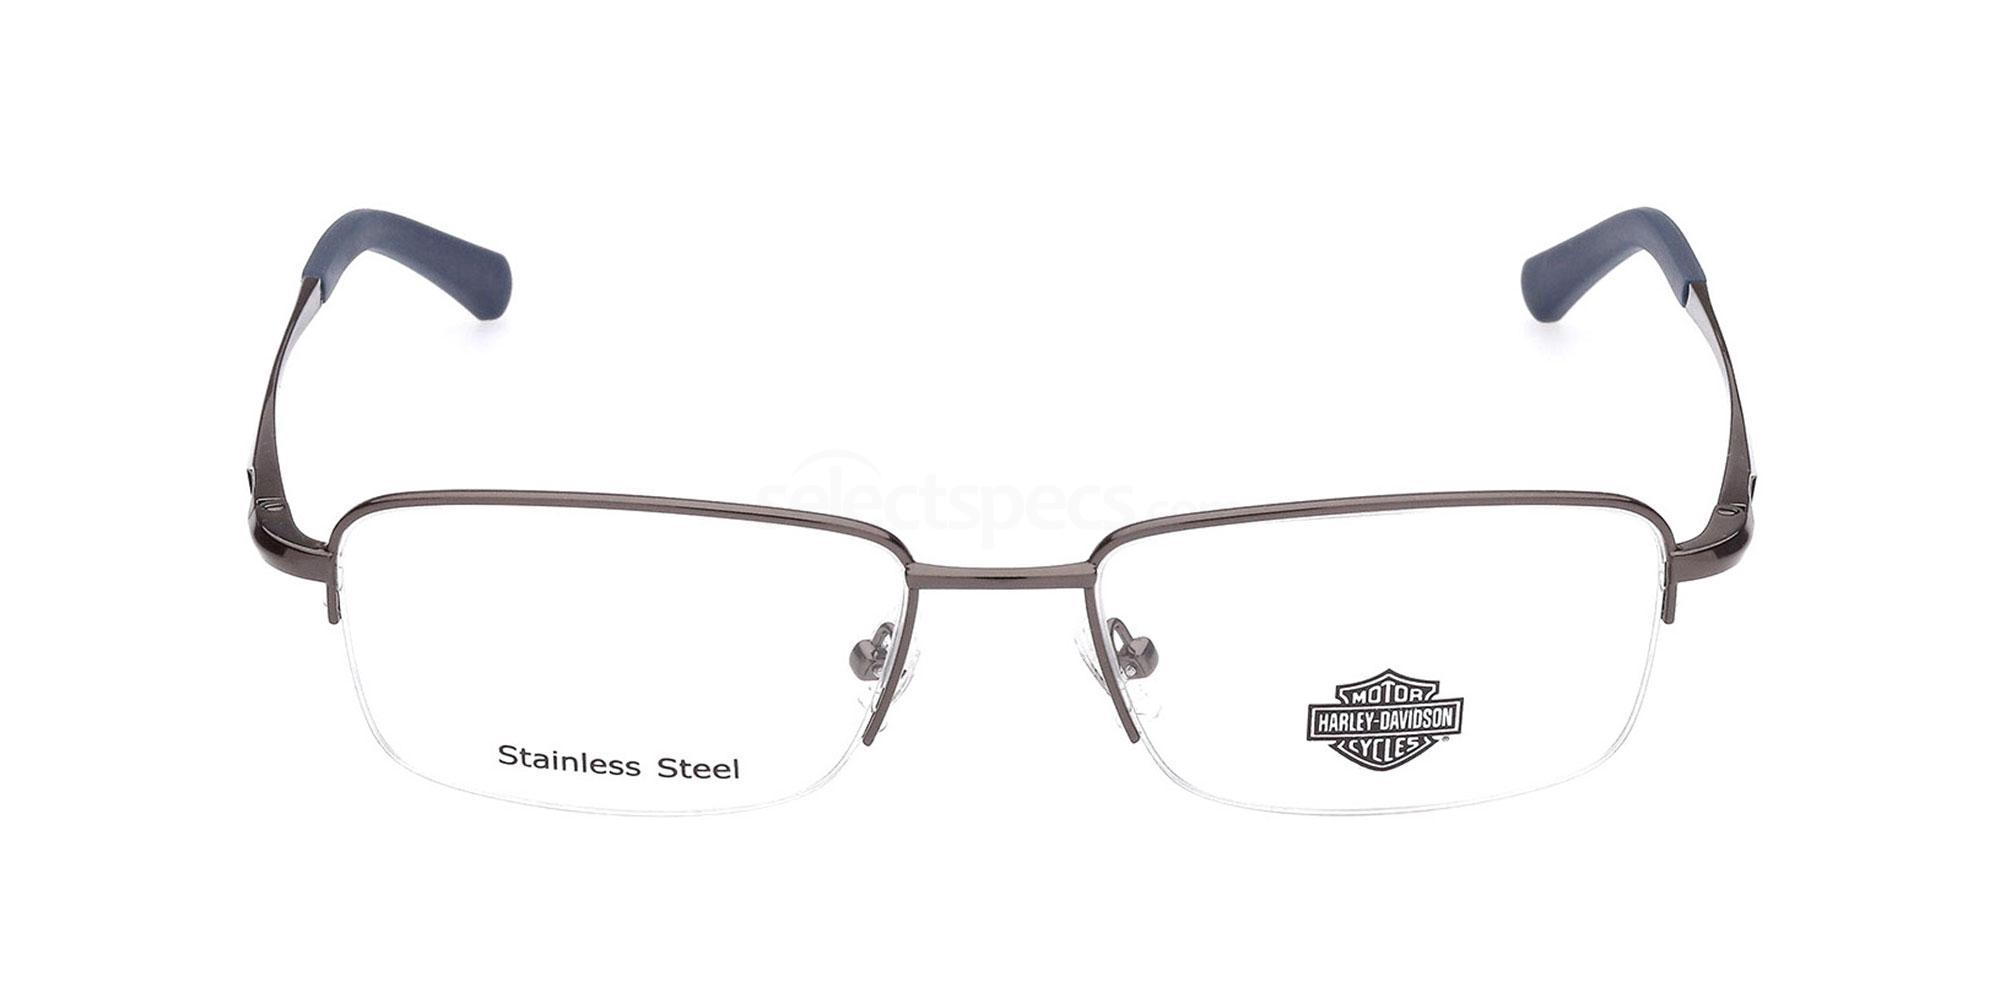 008 HD0820 Glasses, Harley Davidson